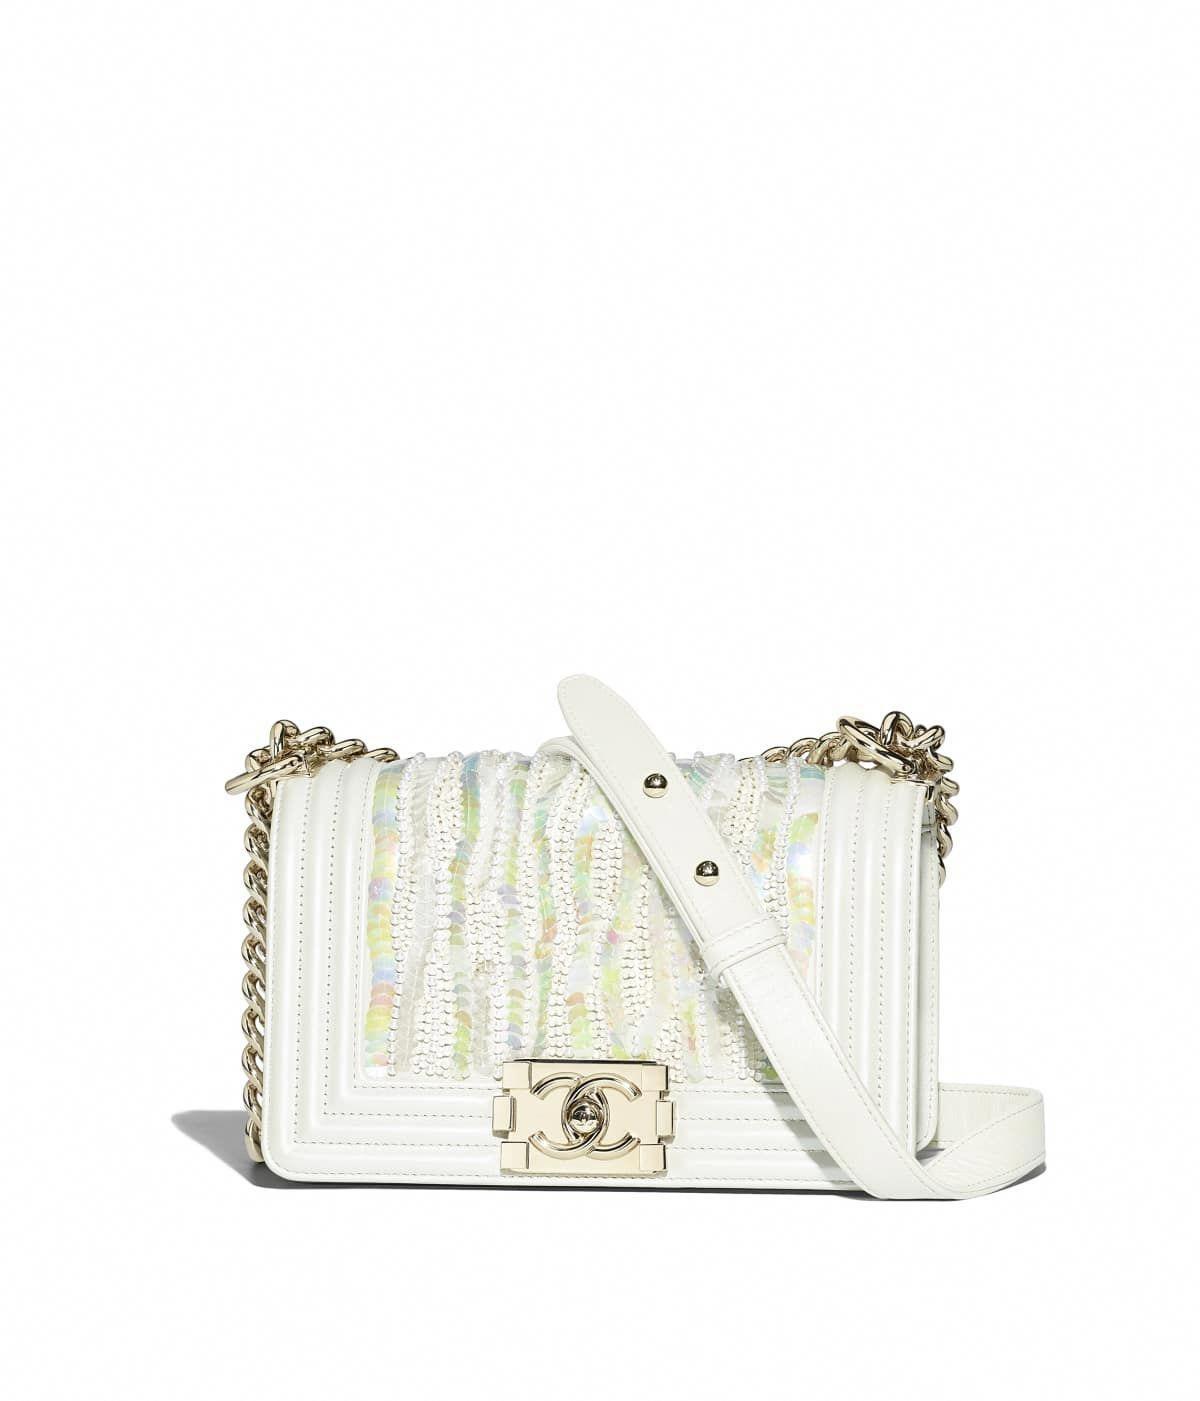 de6e69815d9a Handbags of the Spring-Summer 2018 CHANEL Fashion collection : Small BOY  CHANEL Handbag, metallic embroidered lambskin, sequins, imitation pearls ...